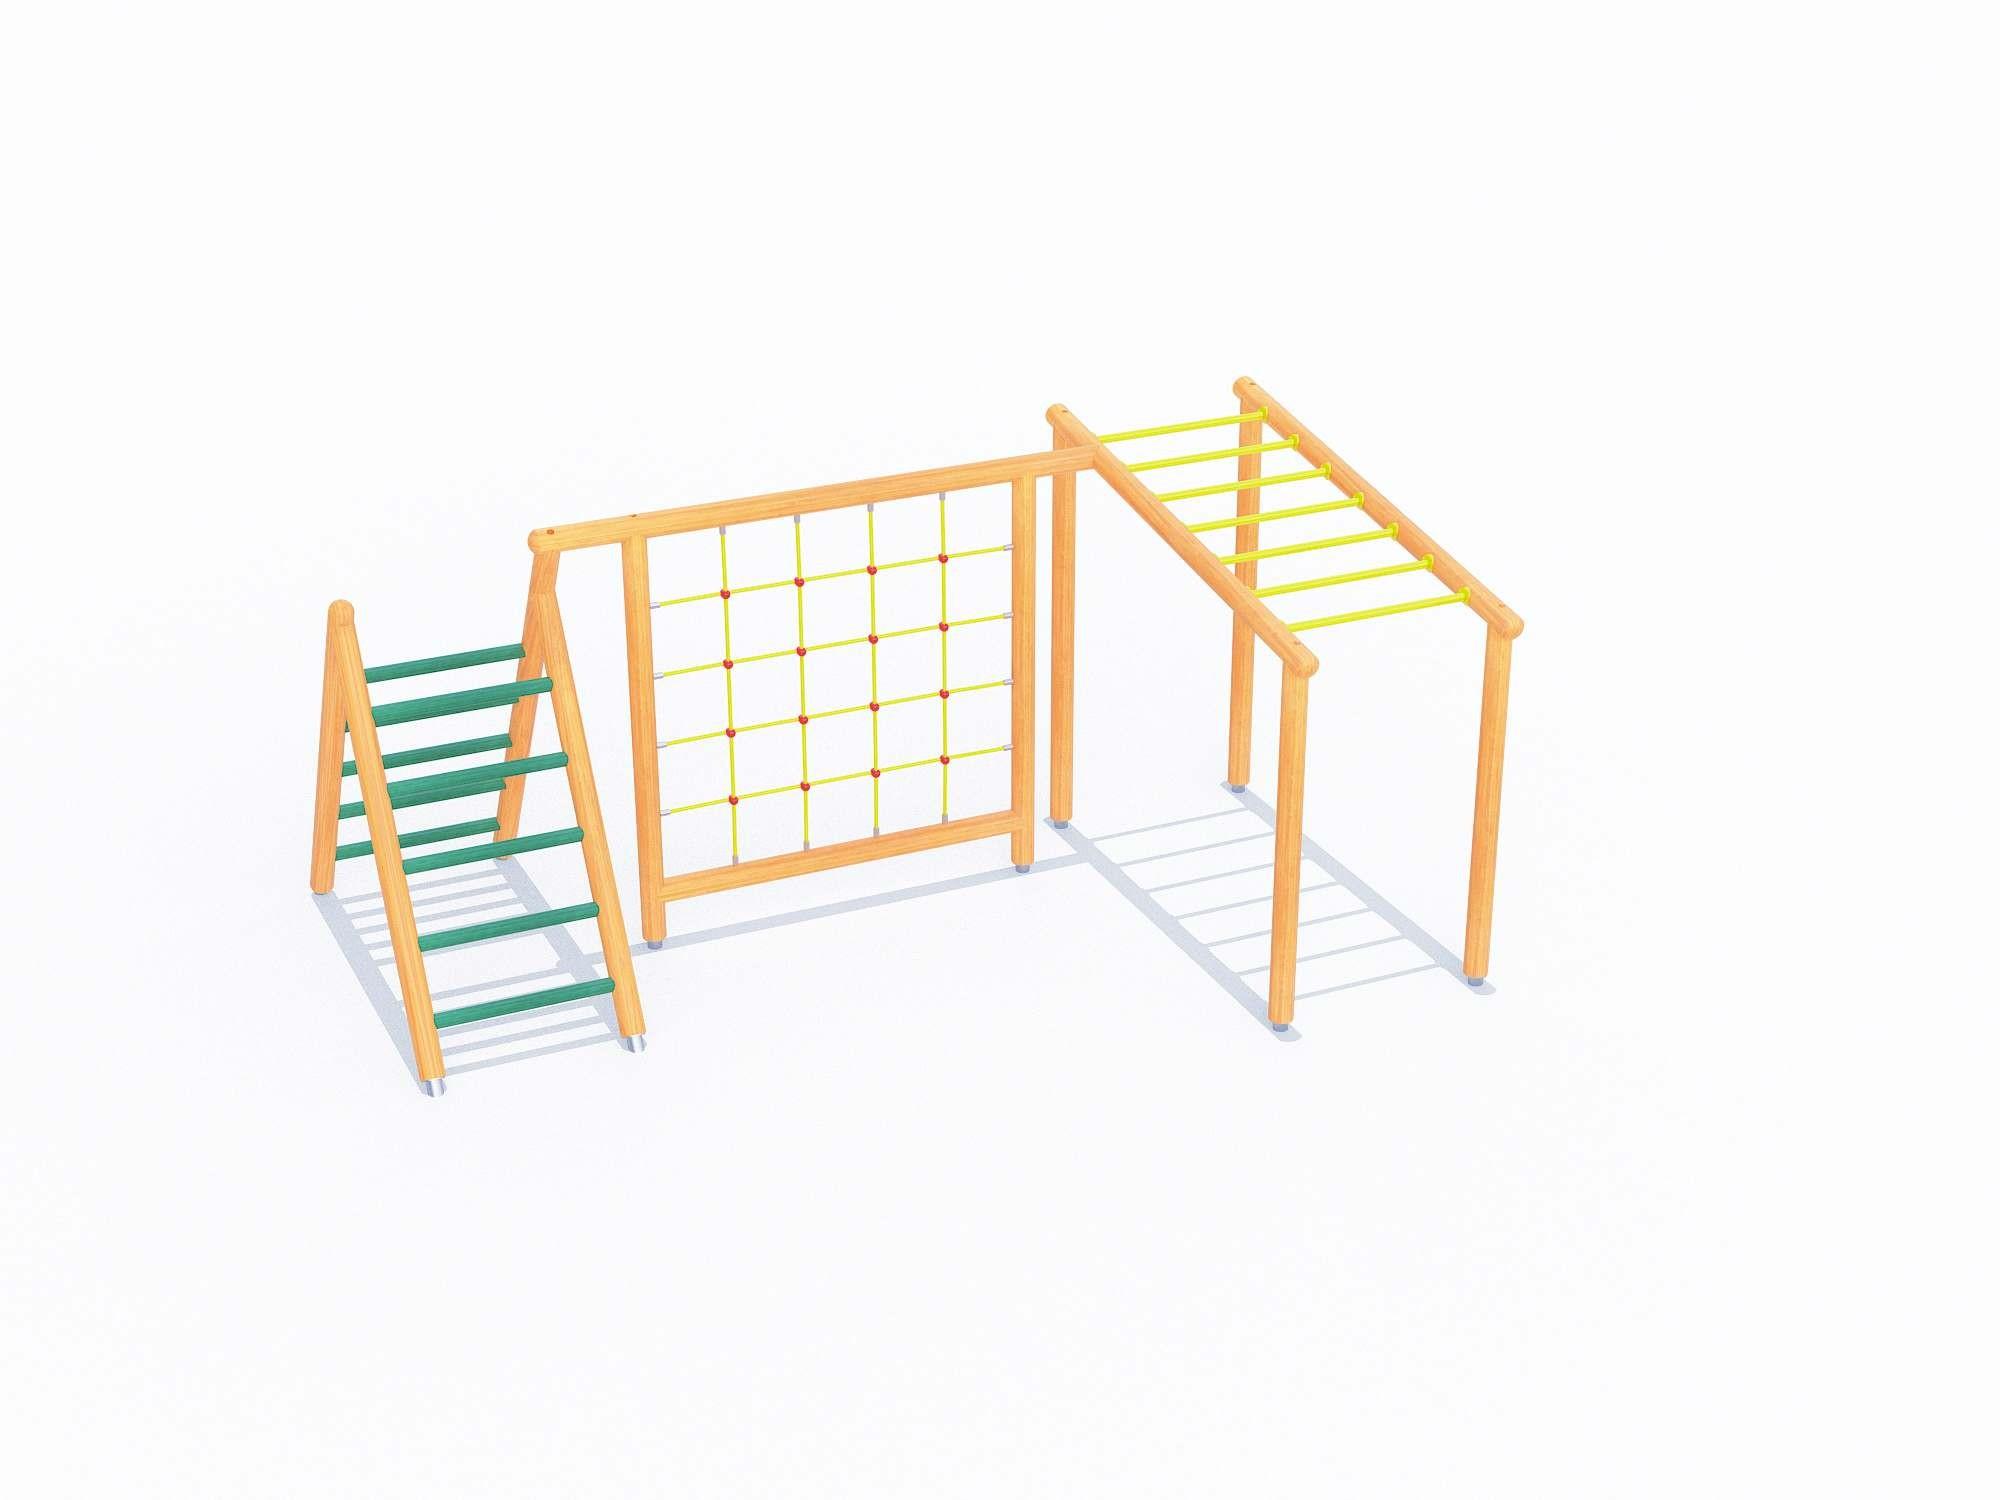 Bąk 3 place zabaw projekty realizacje